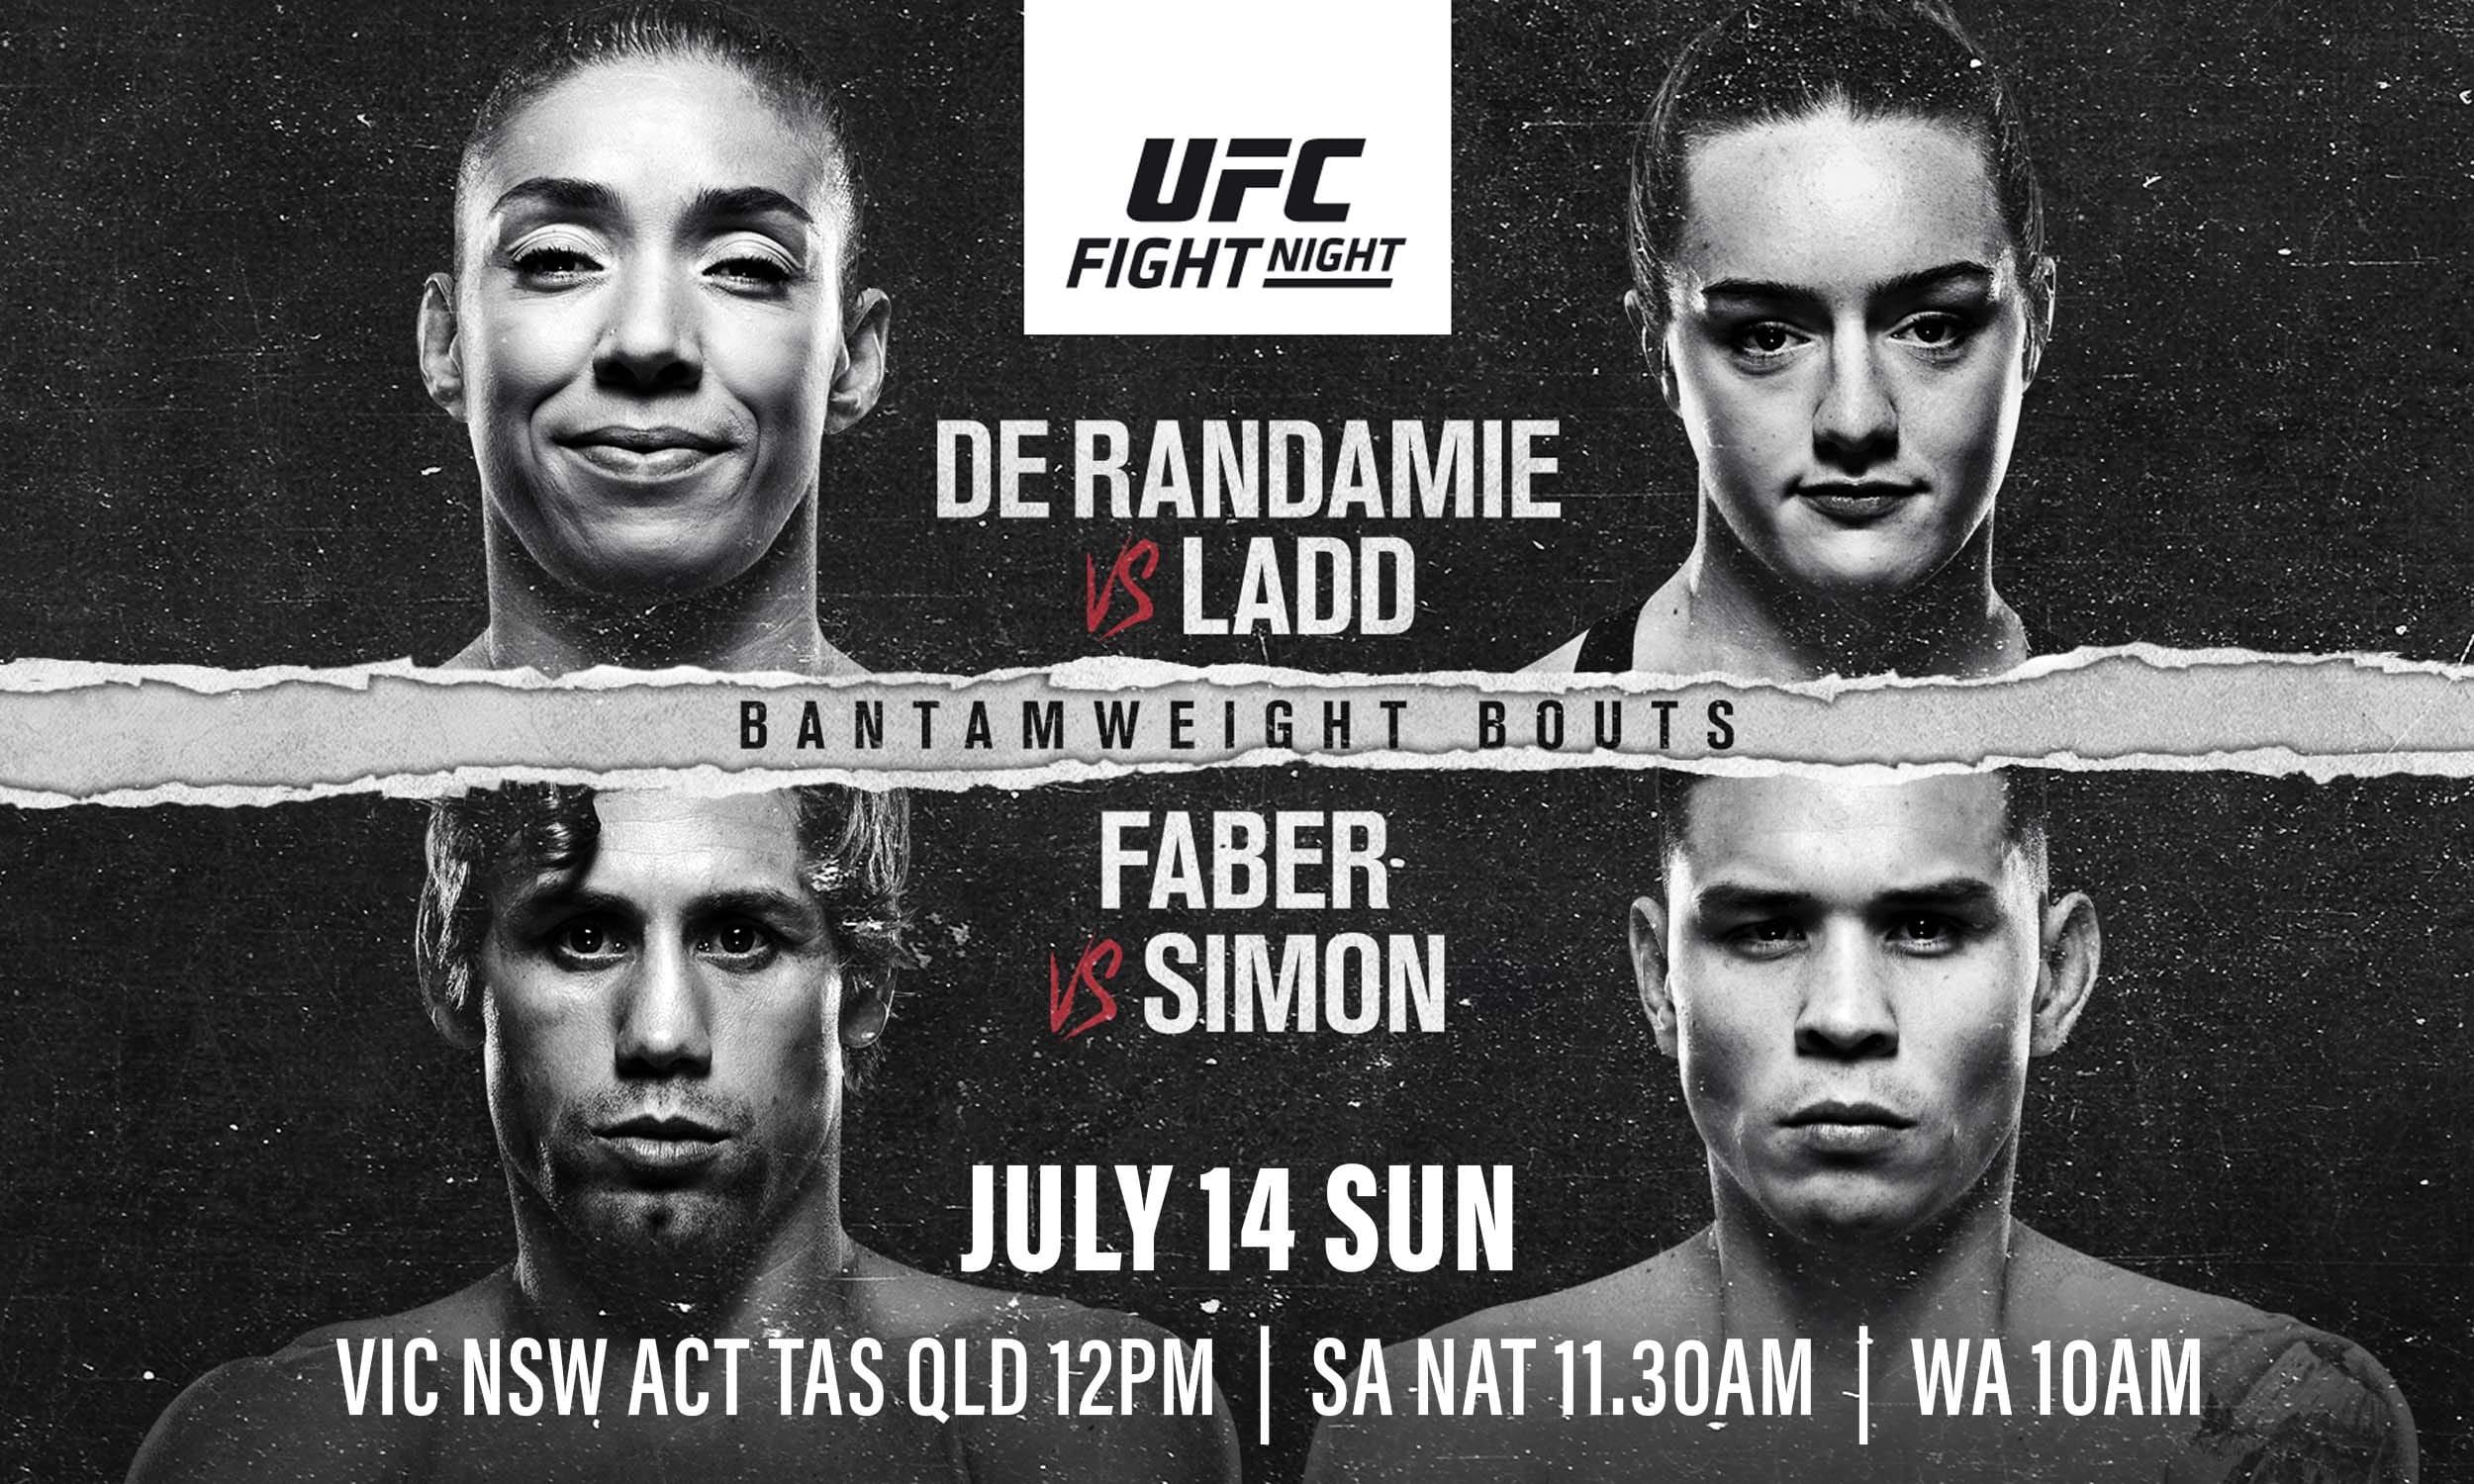 UFC Fight Night_De Randamie vs Ladd_July 14_BATP-min.jpg